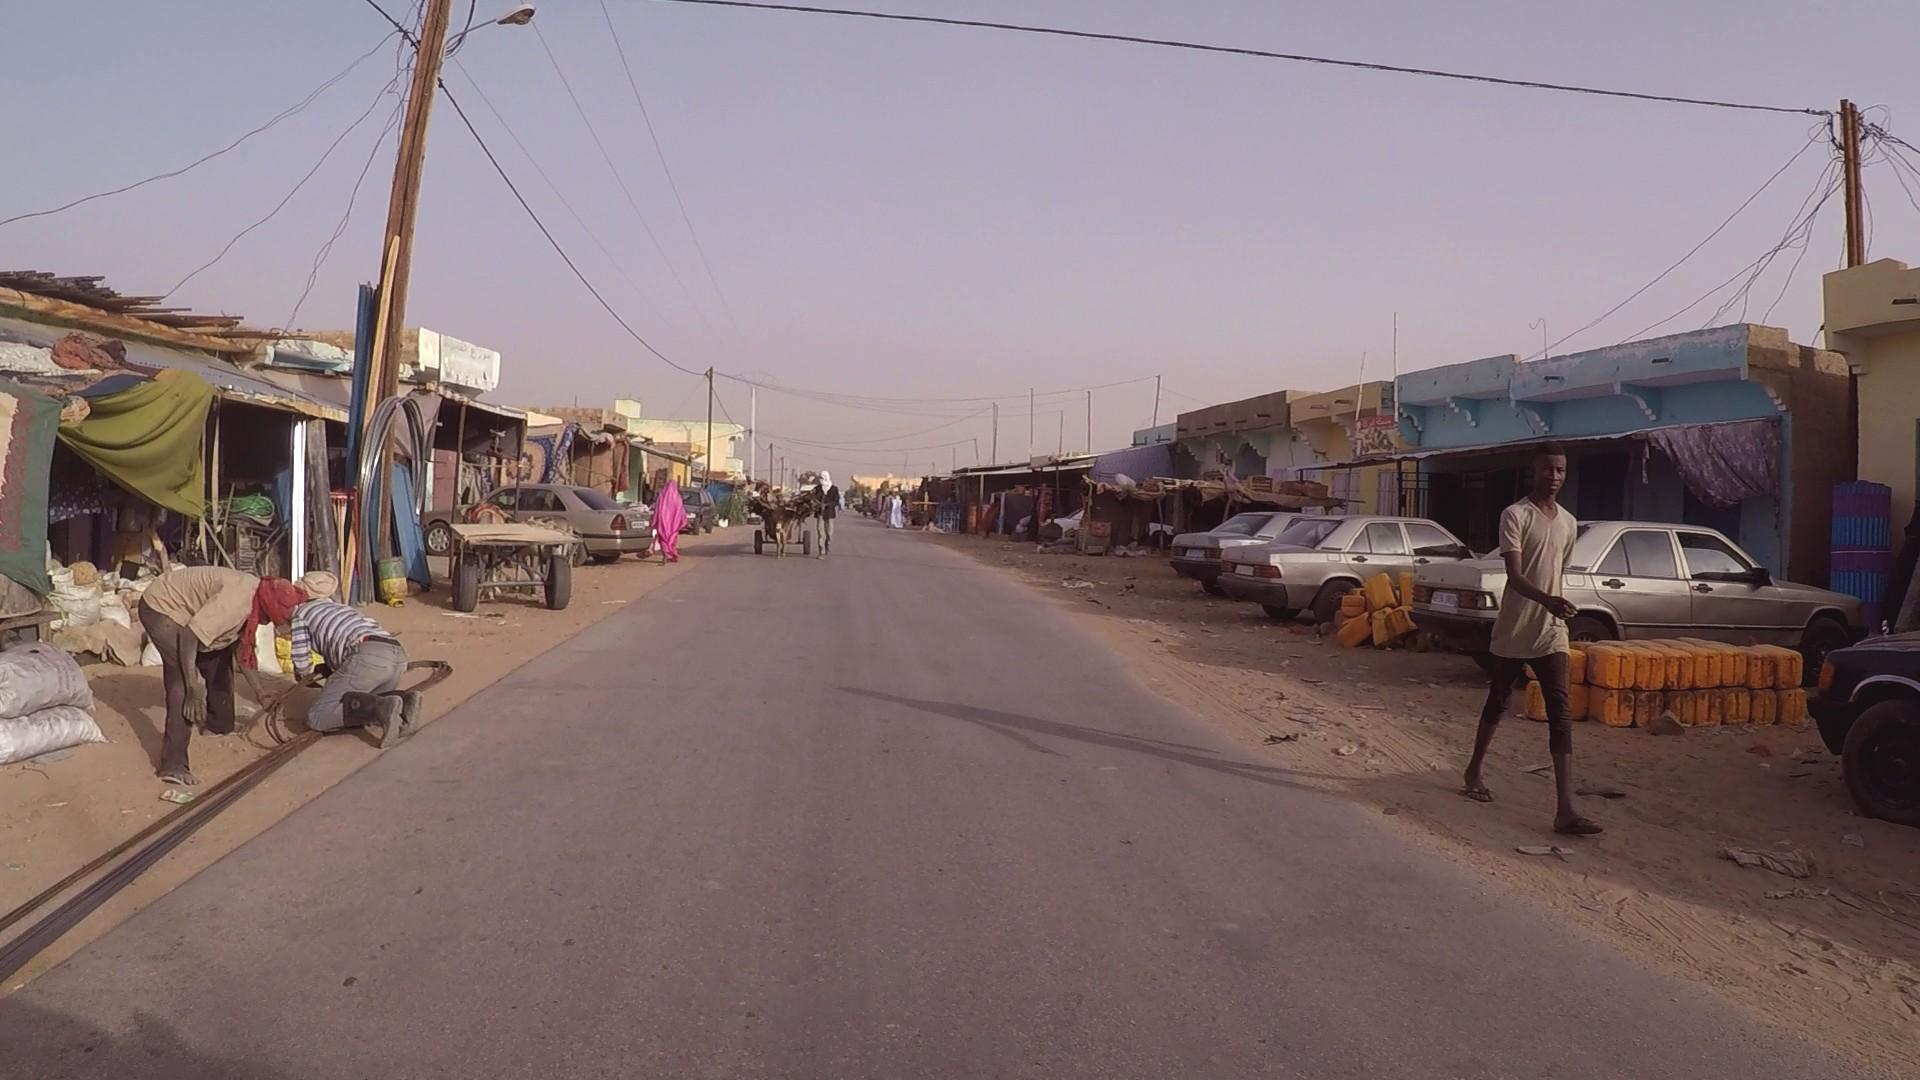 pueblo carretera mauritania pablocaminante - Mauritania 4/5, Nouakchott a Gogui